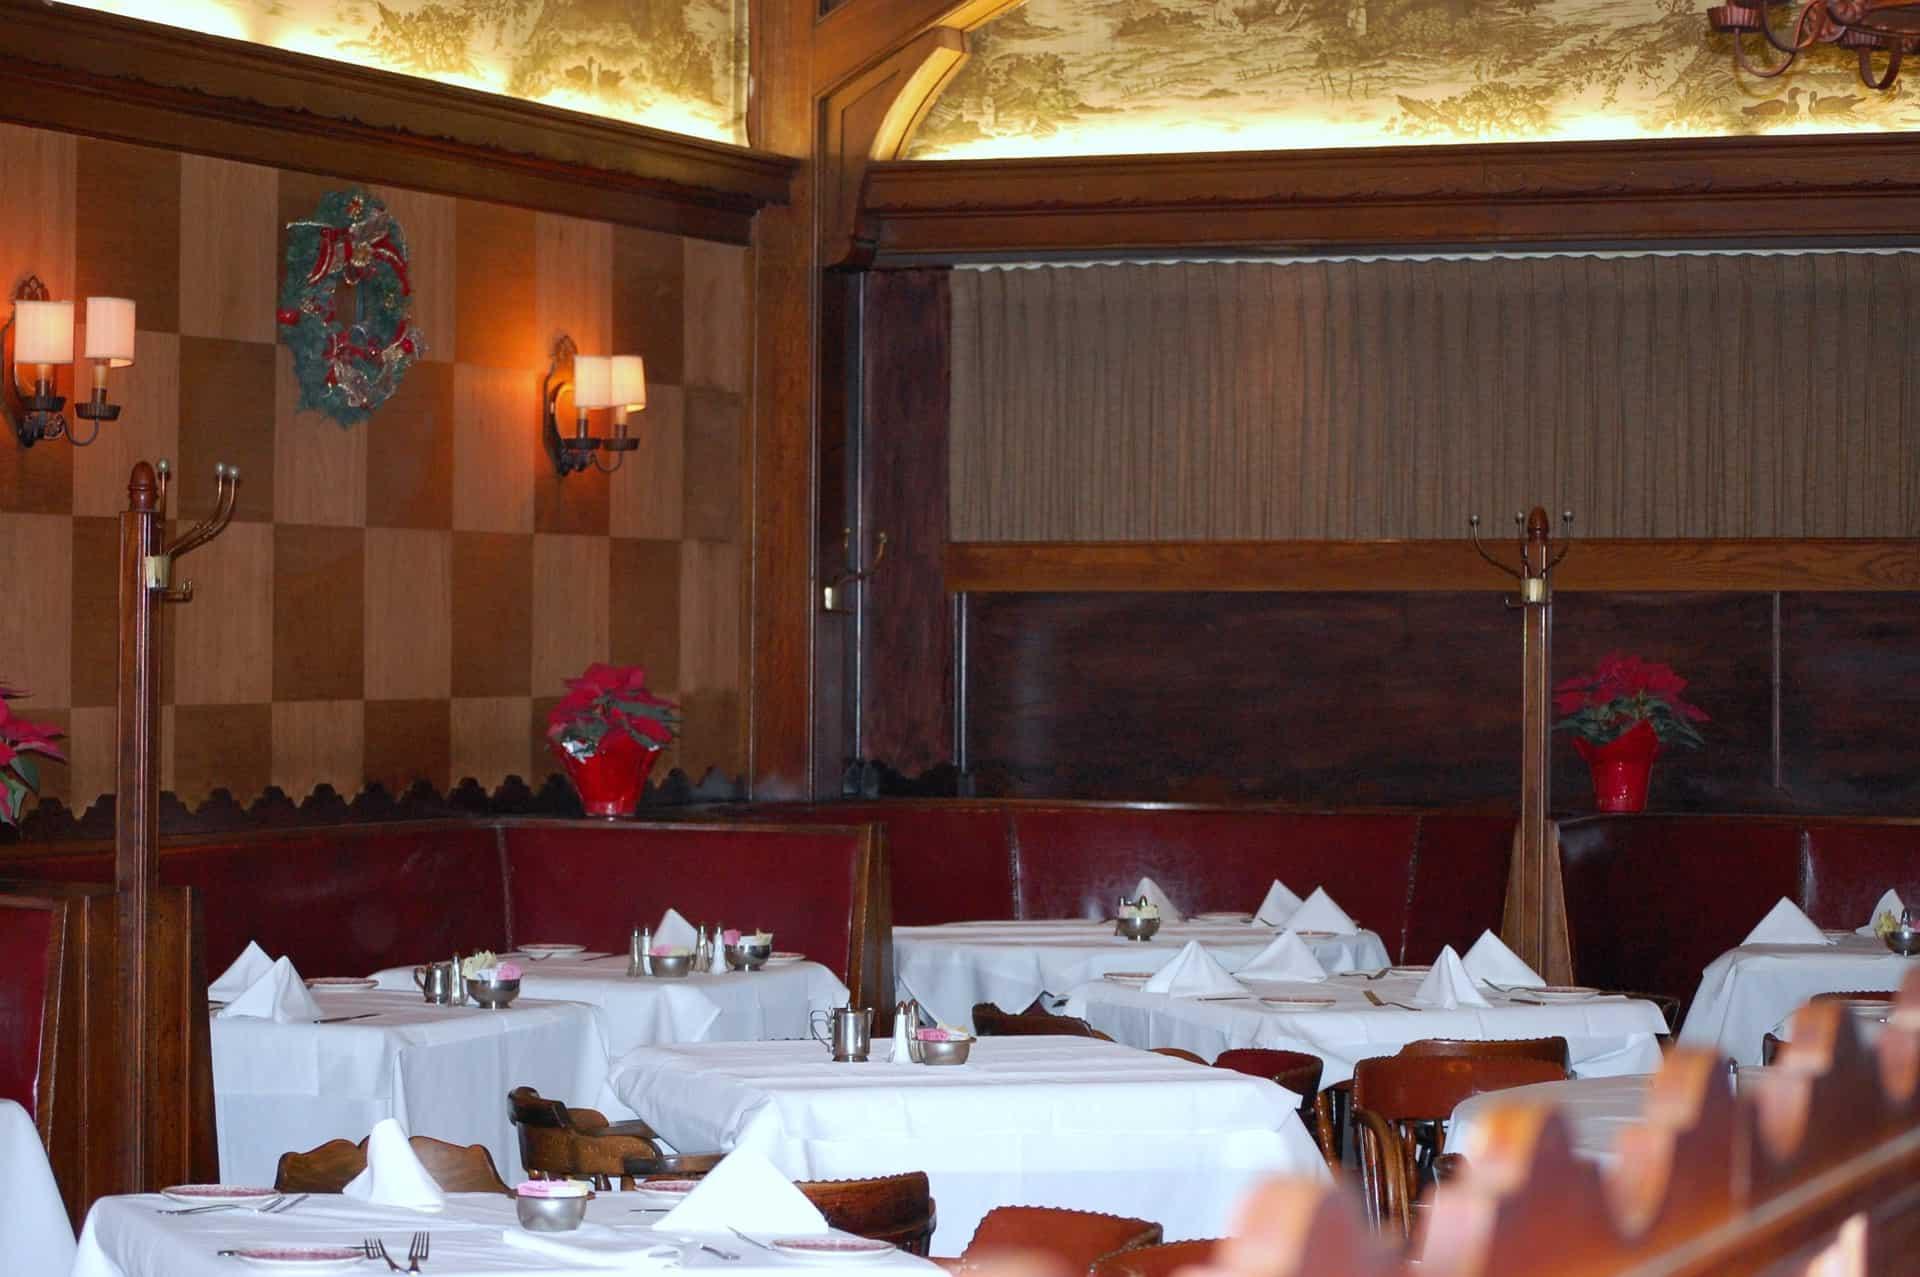 musso franks dining room la time machine